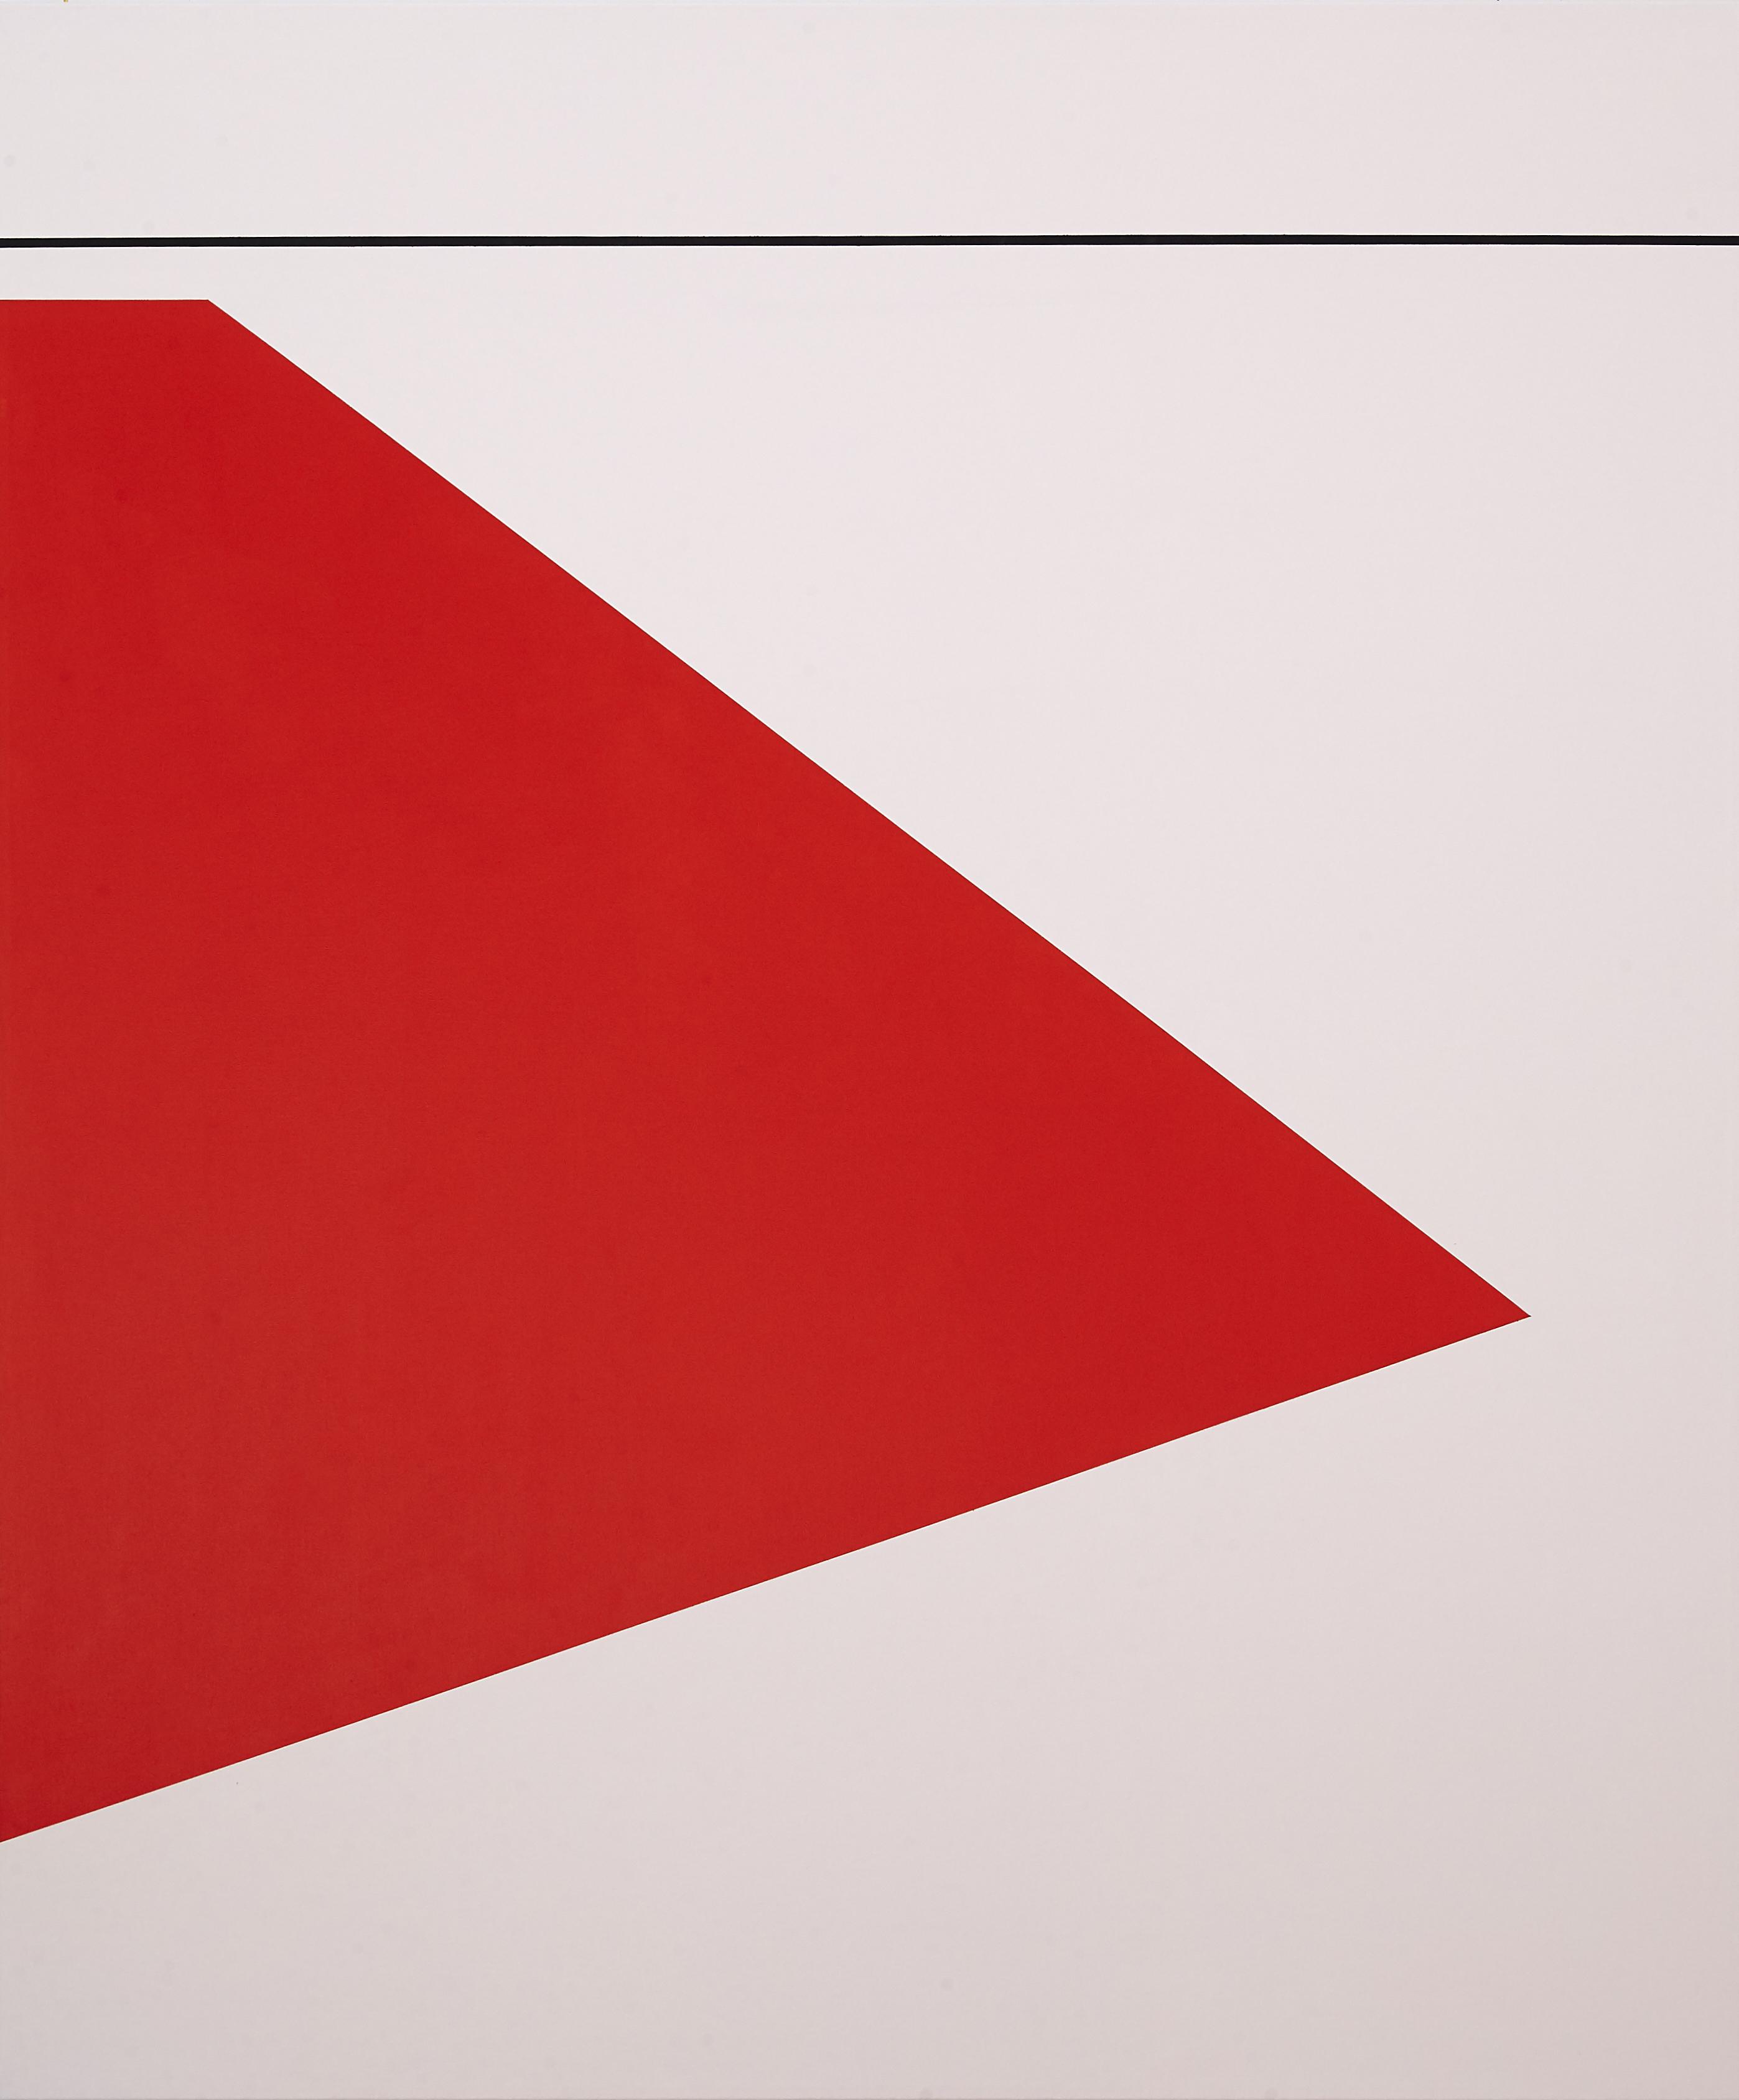 100x120cm/Akryl på lærred